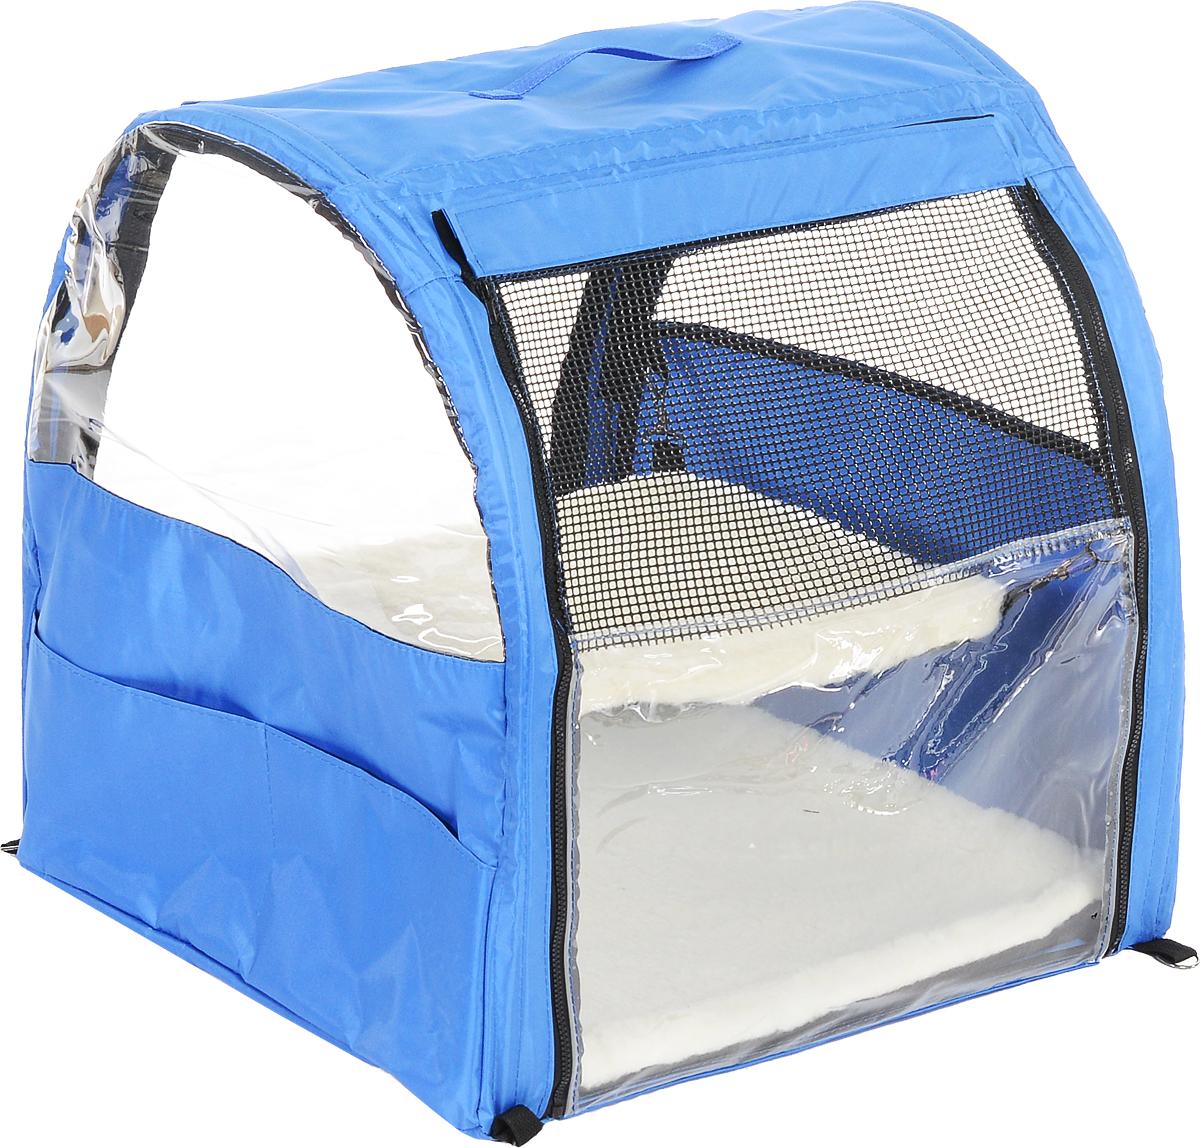 "Клетка для животных ""Заря-Плюс"", выставочная, цвет: голубой, черный, 51 х 58 х 55 см КВП1г"